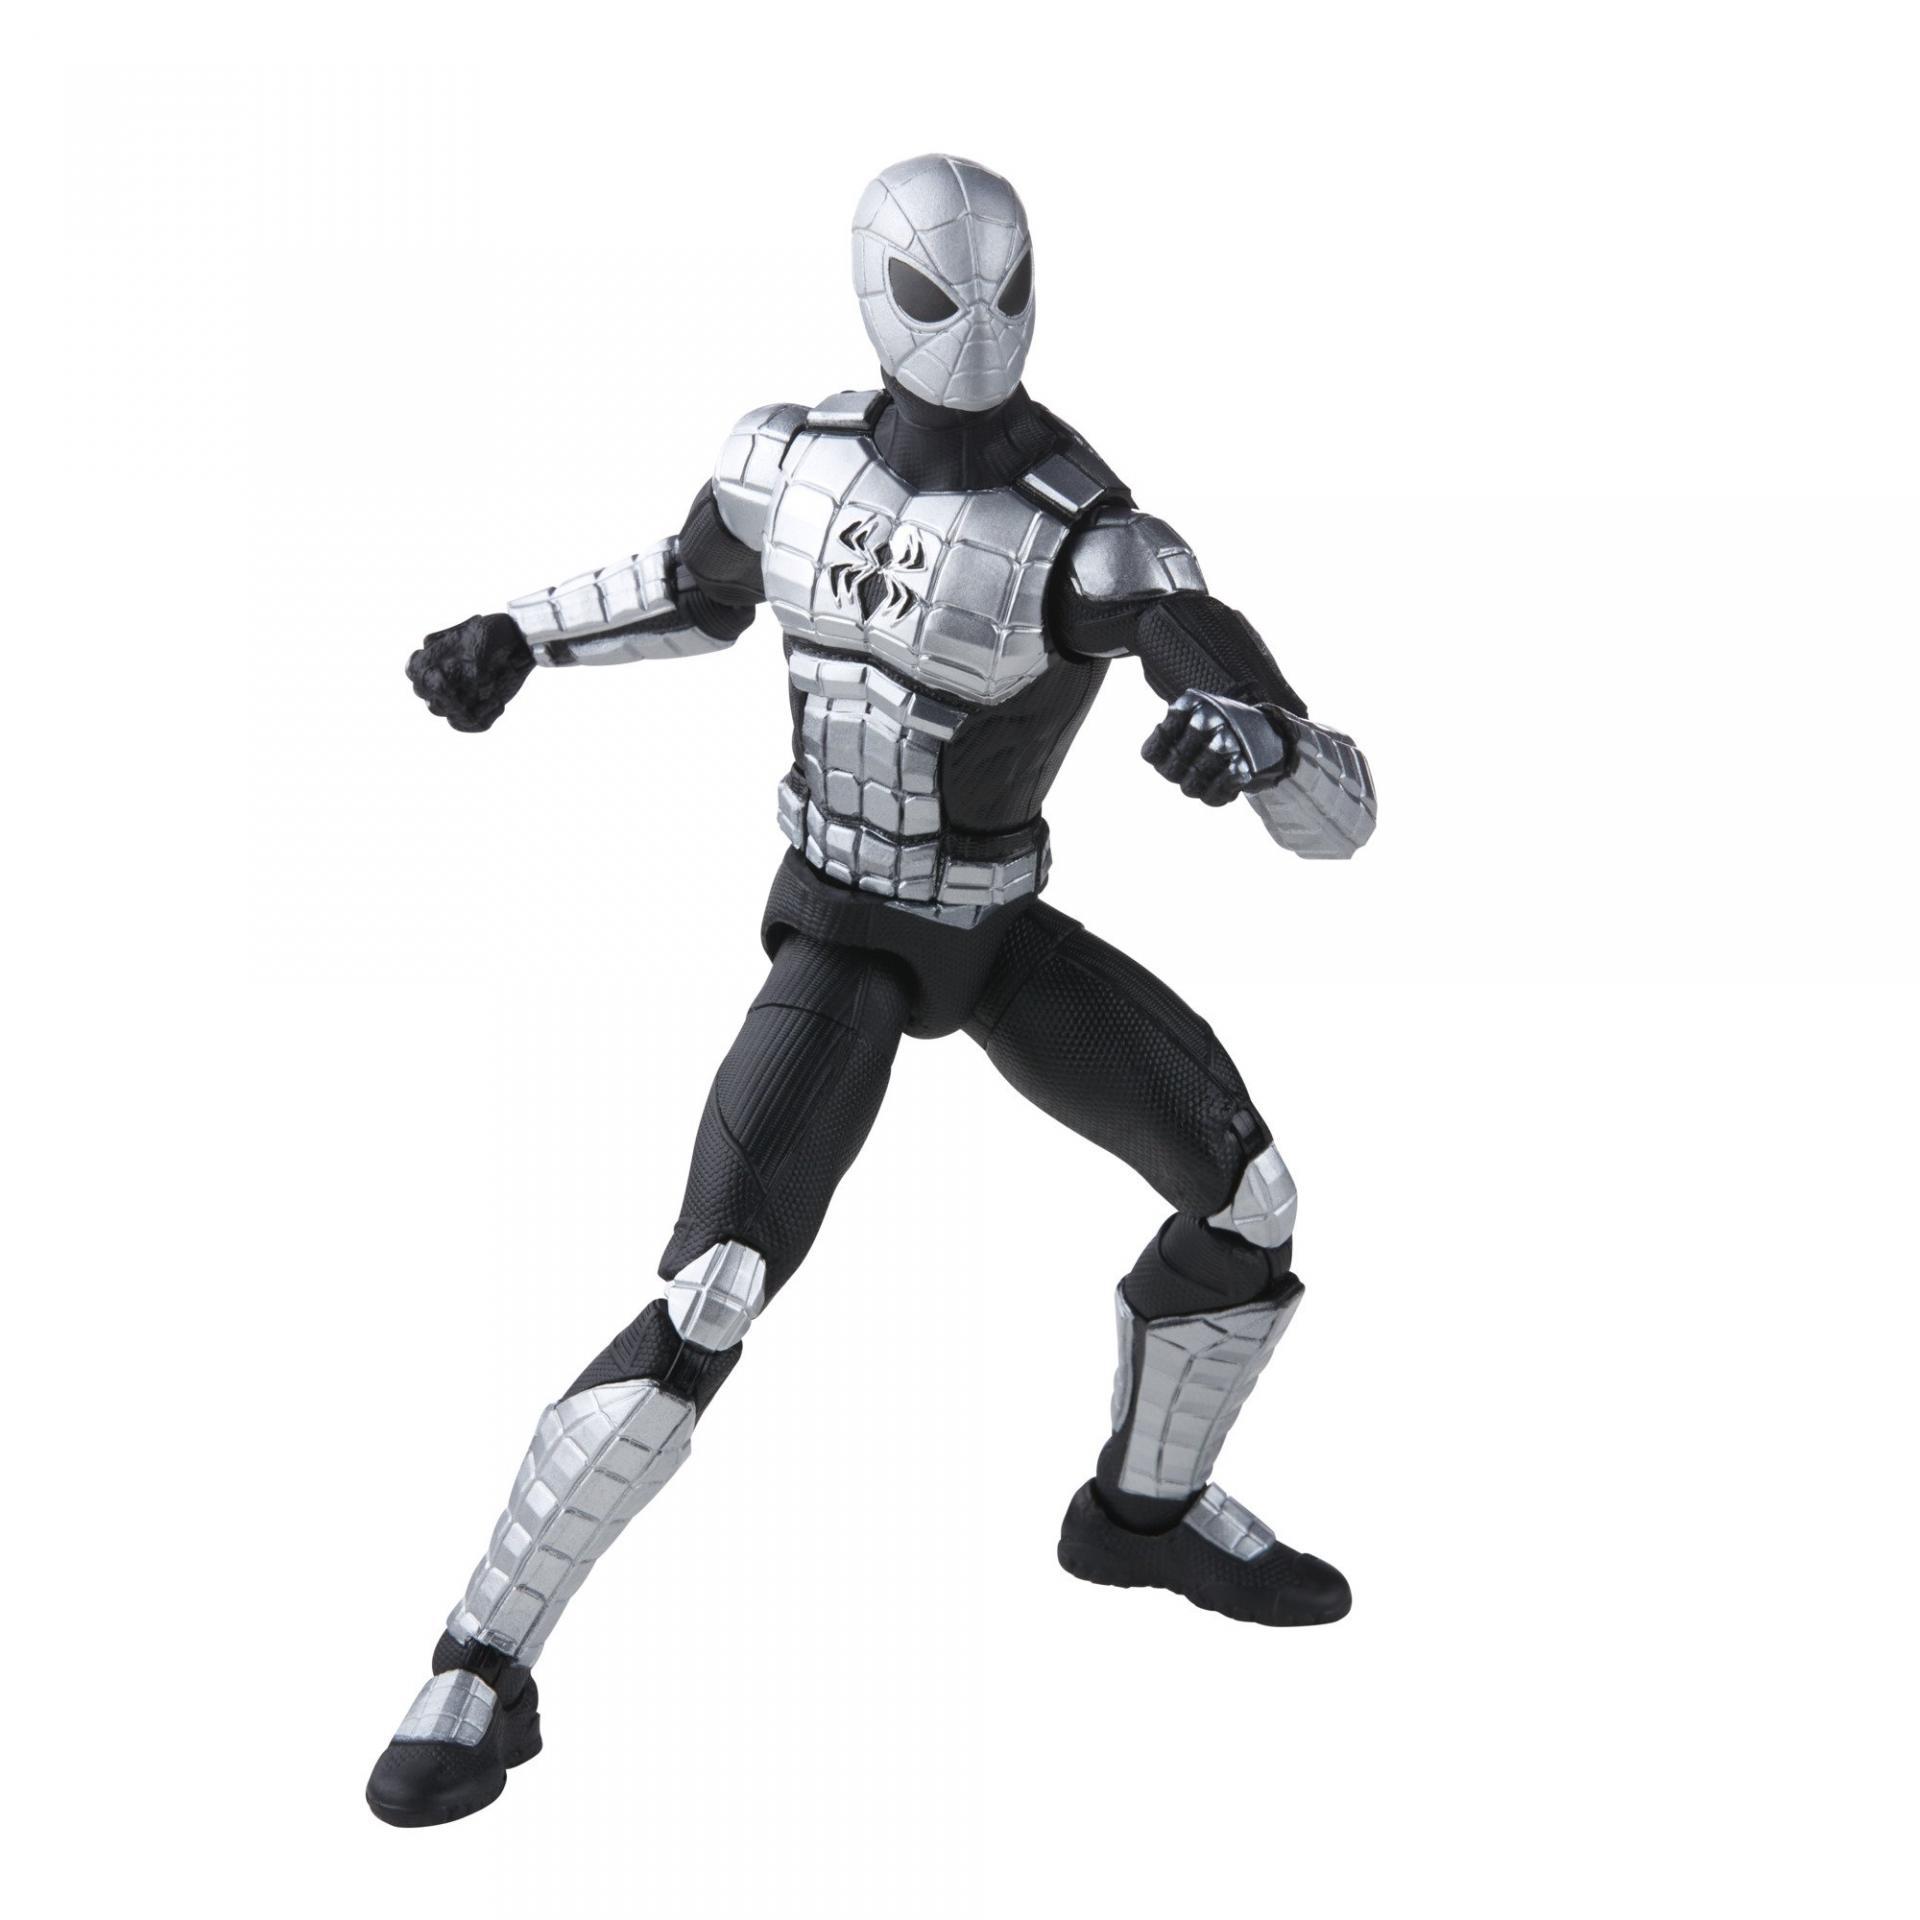 Marvel legends series hasbro spider armor mk i7 1